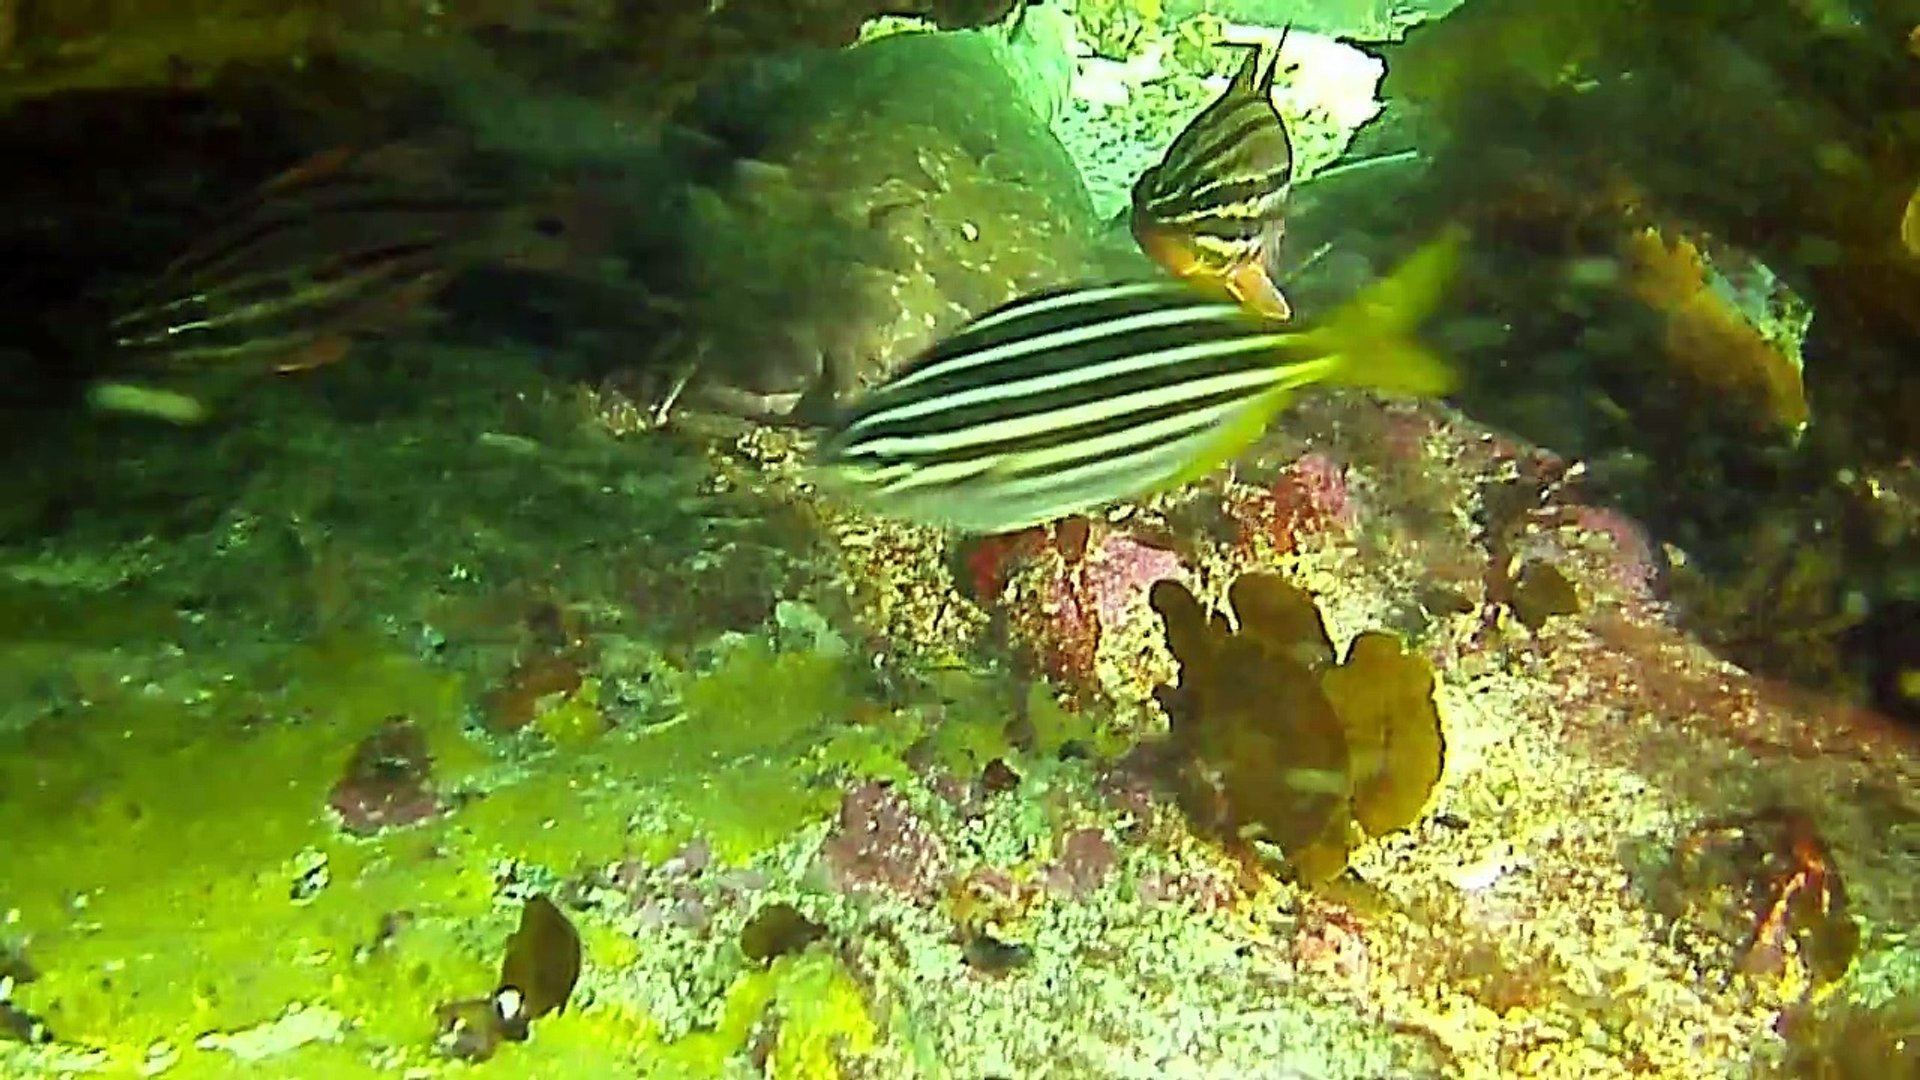 Shelley Beach Dive - The Blueys Return